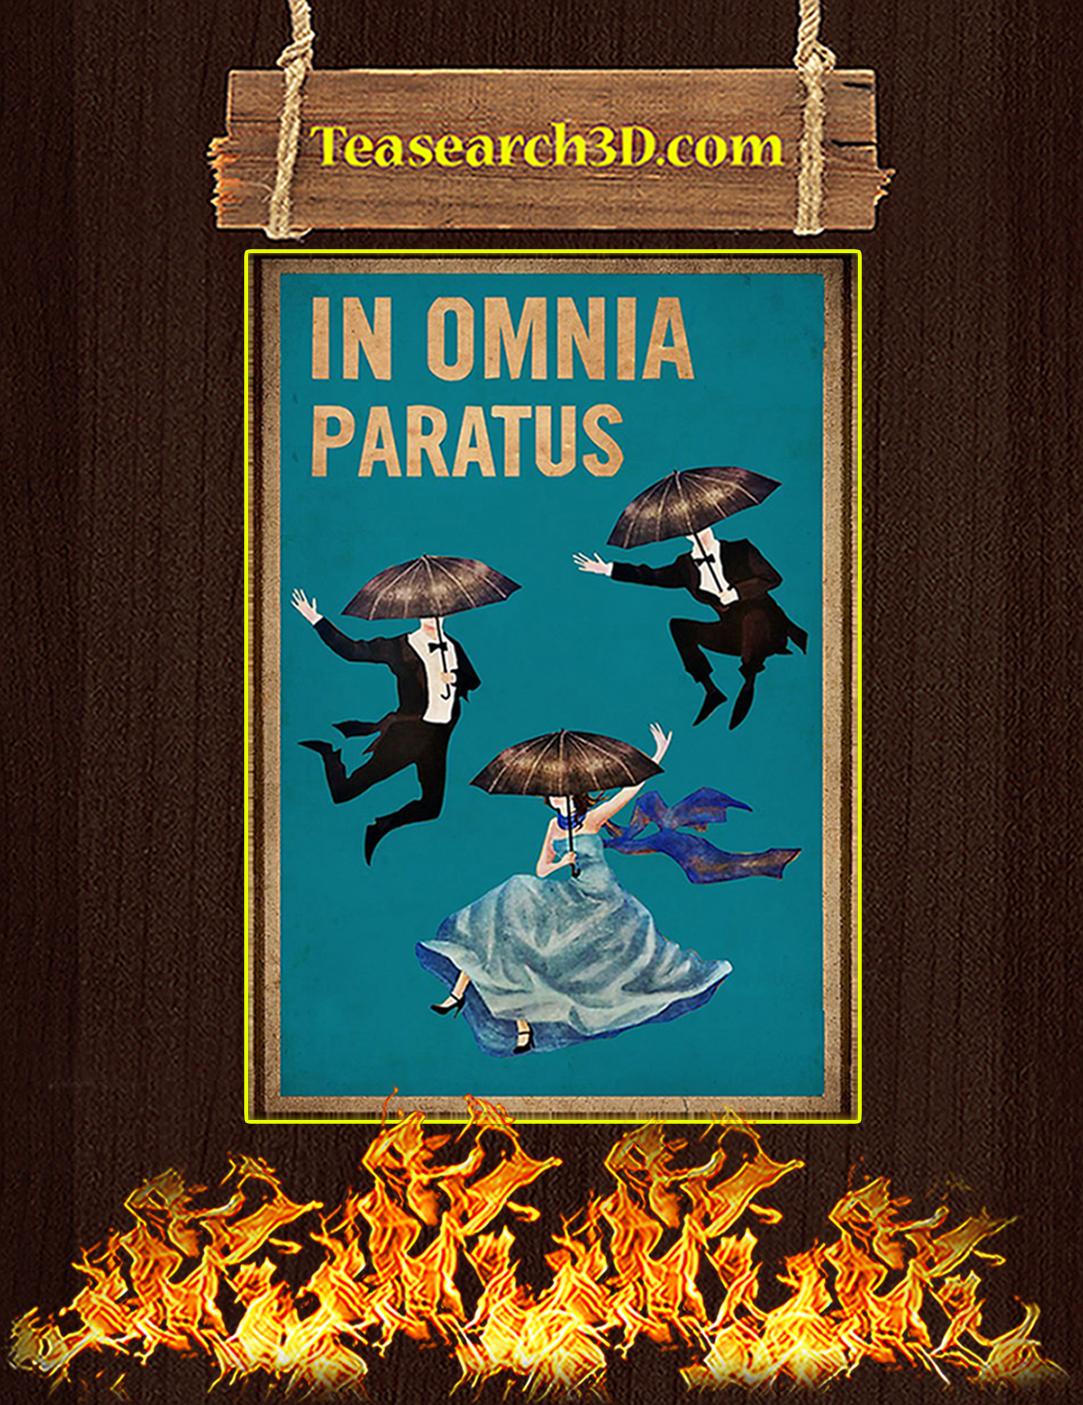 In omnia paratus poster A2